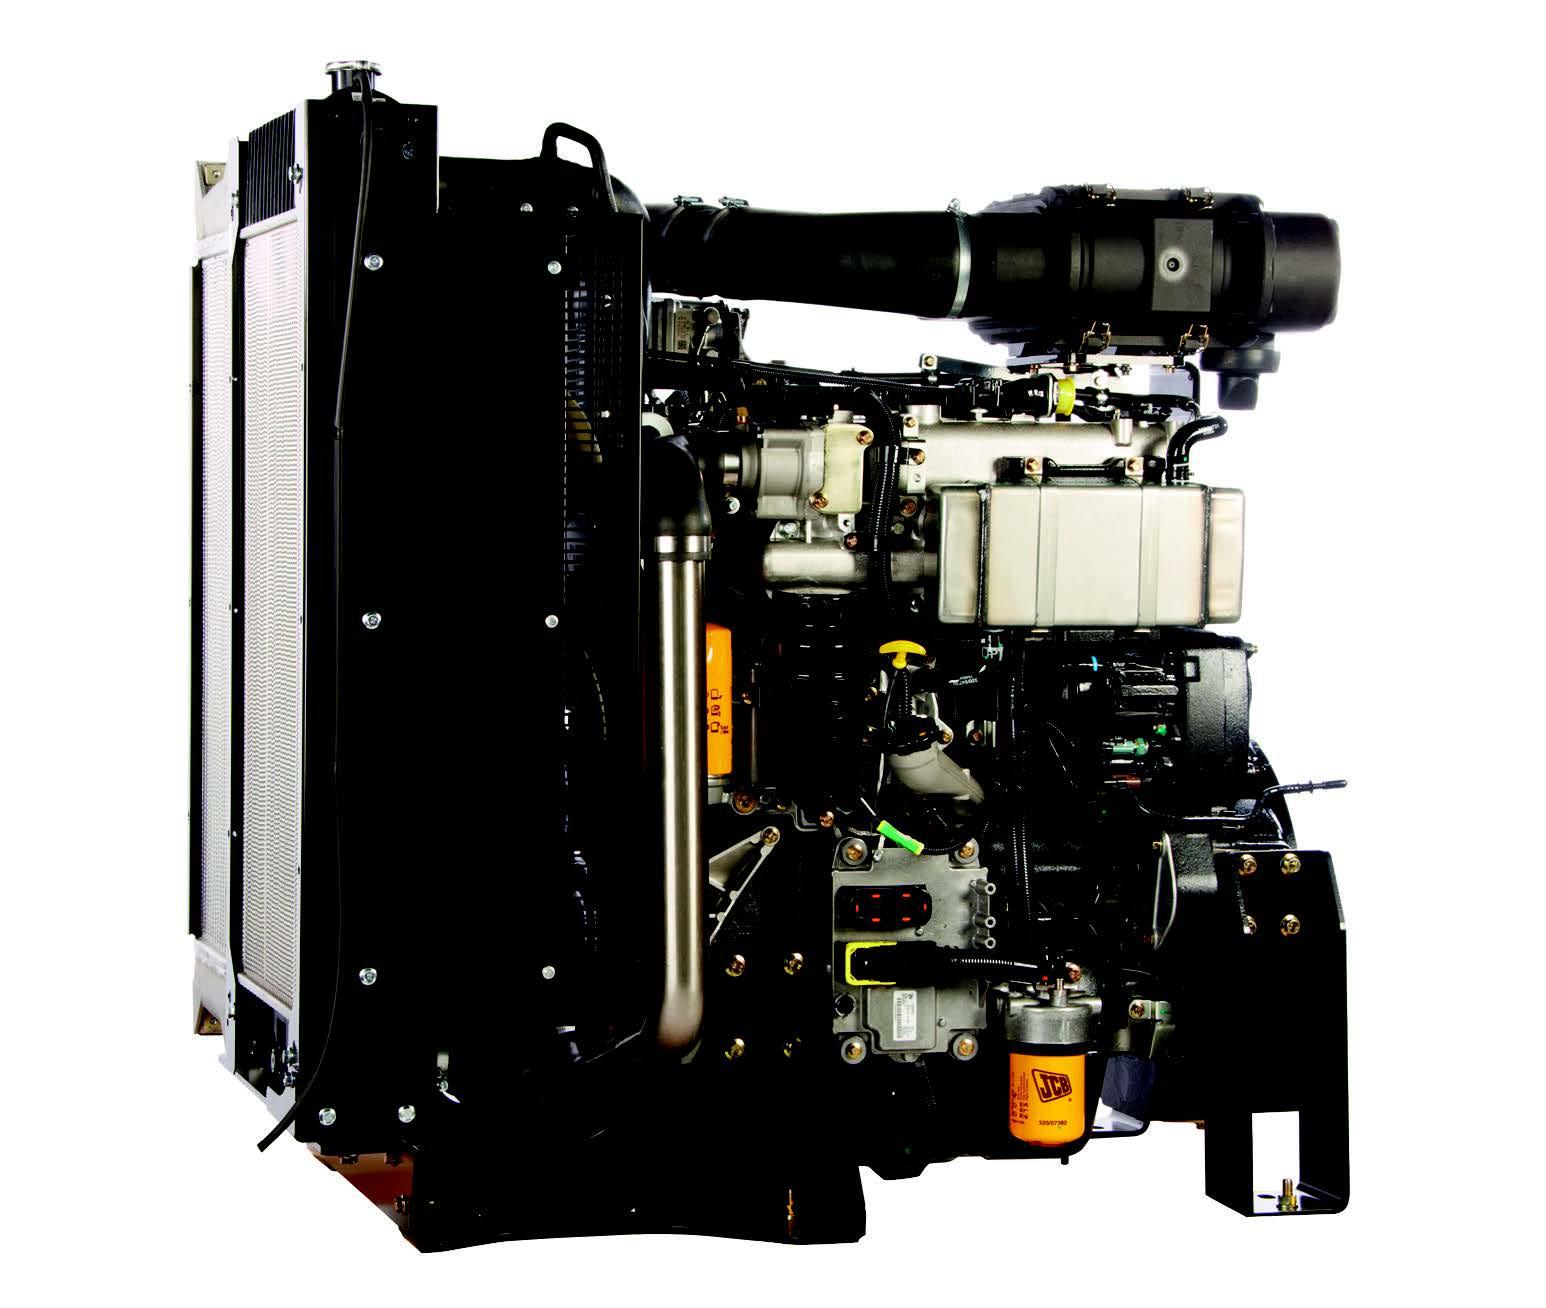 Industrial Power Units EU Stage IIIB / EPA Tier 4 Interim 129kW (173hp)